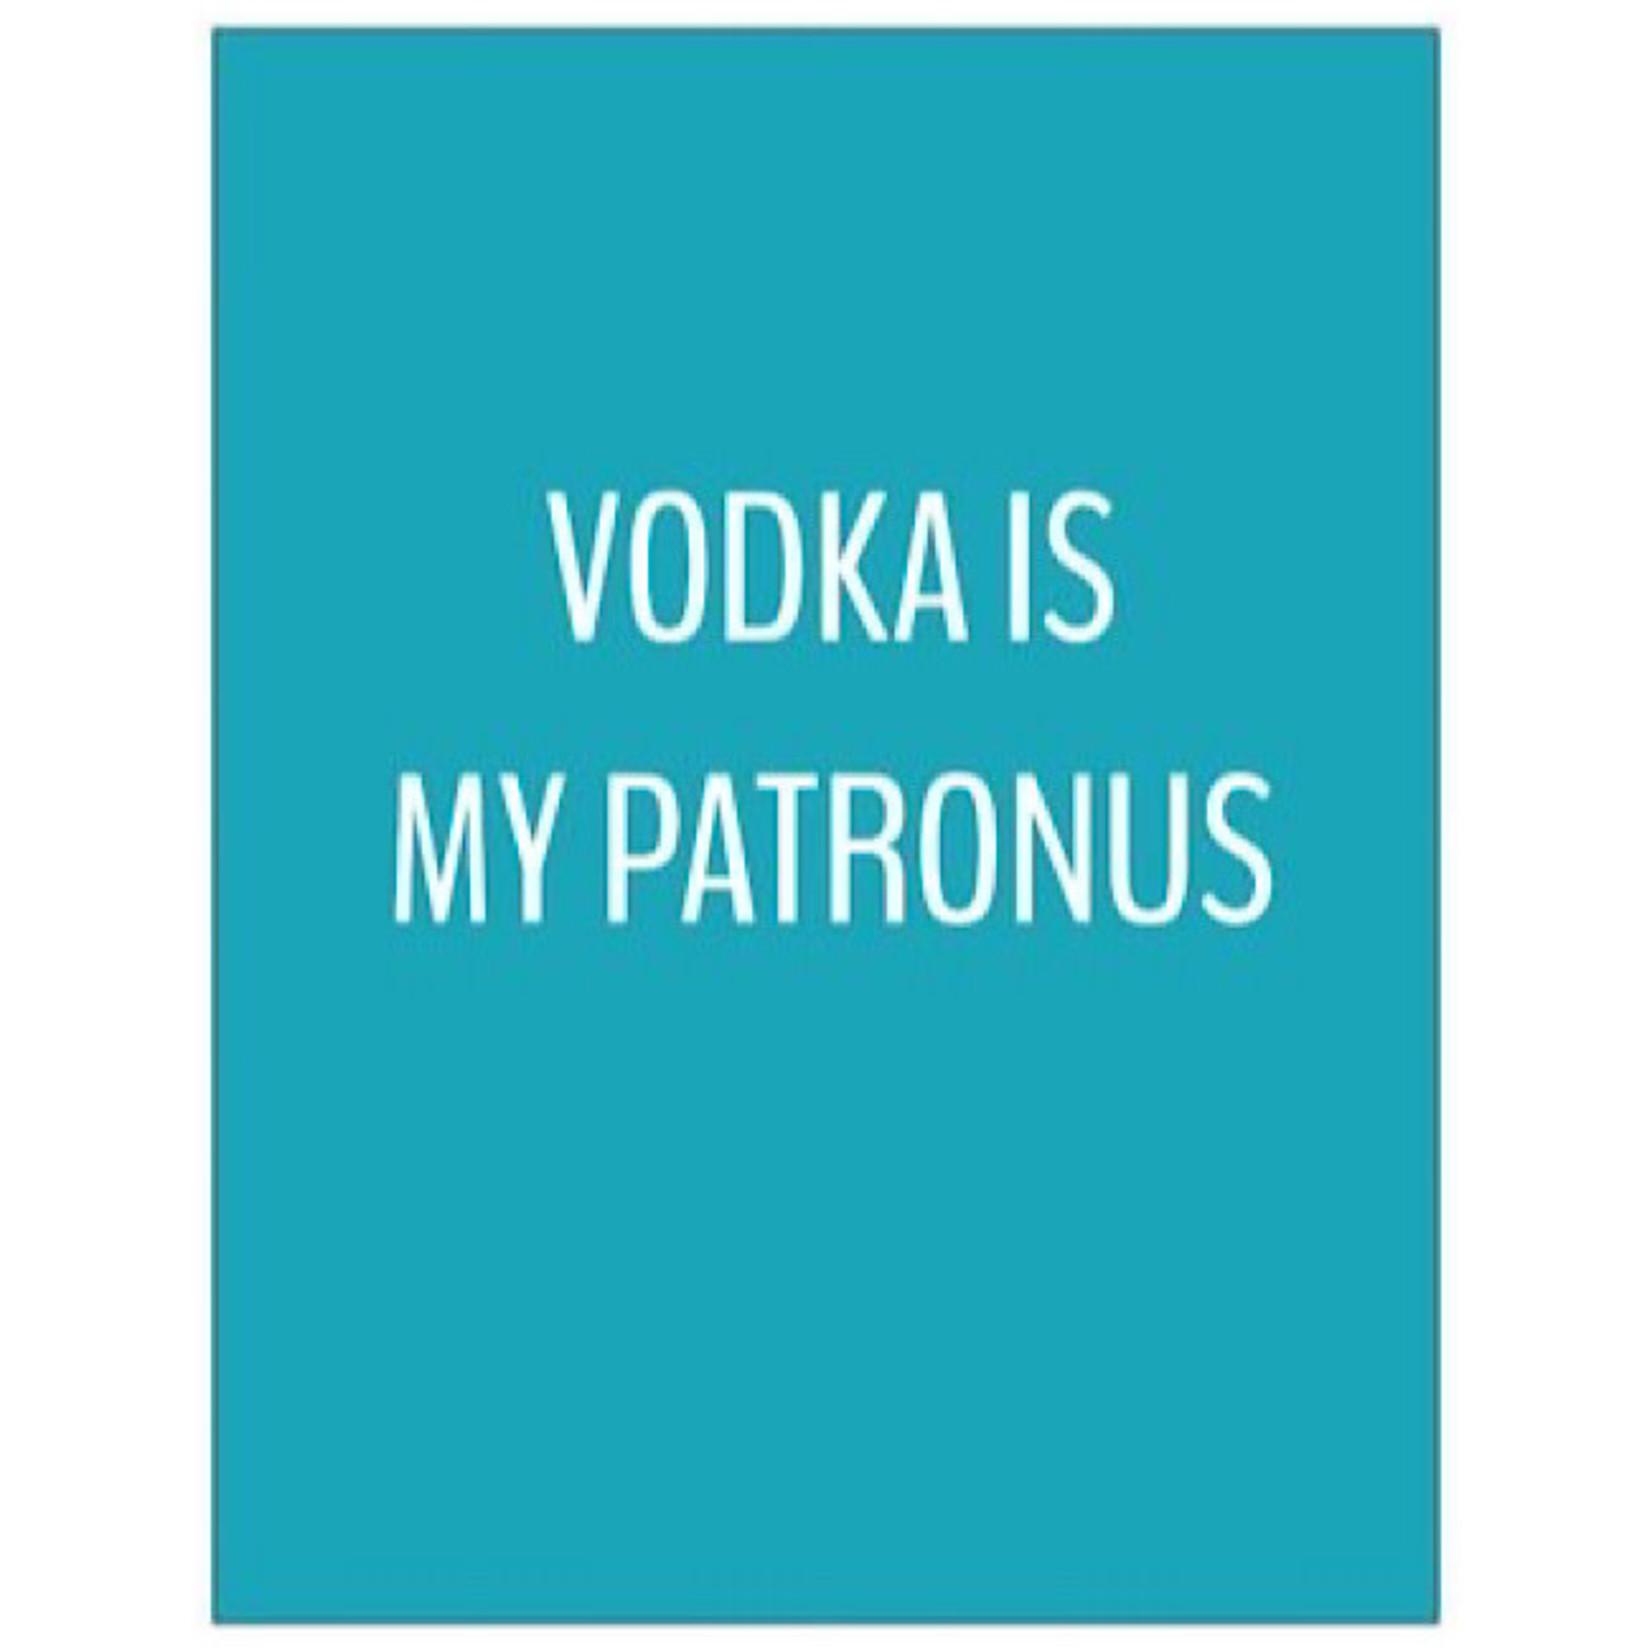 Bad Annie's Card #050 - Vodka Is My Patronus